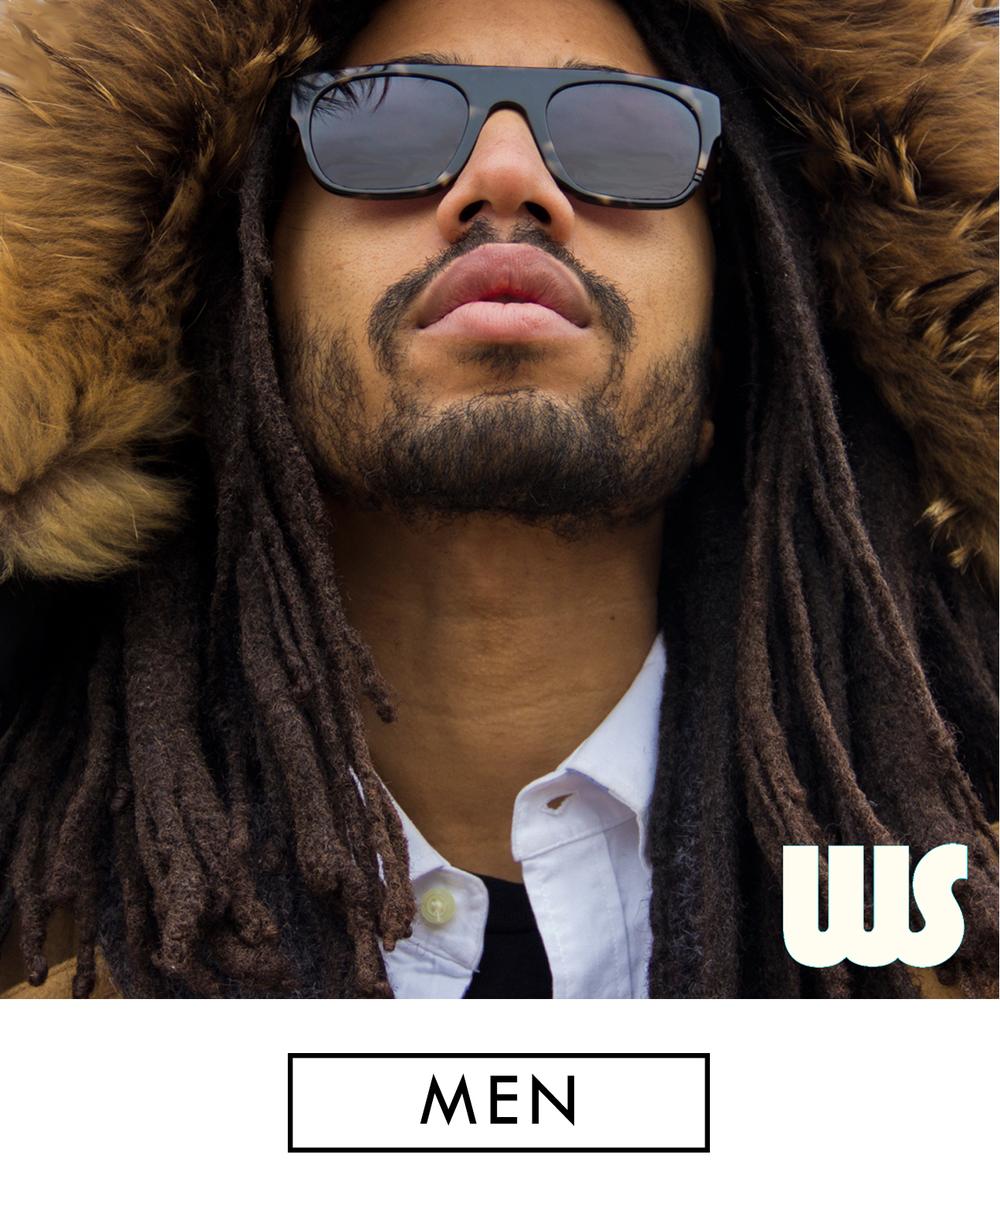 MENS.jpg